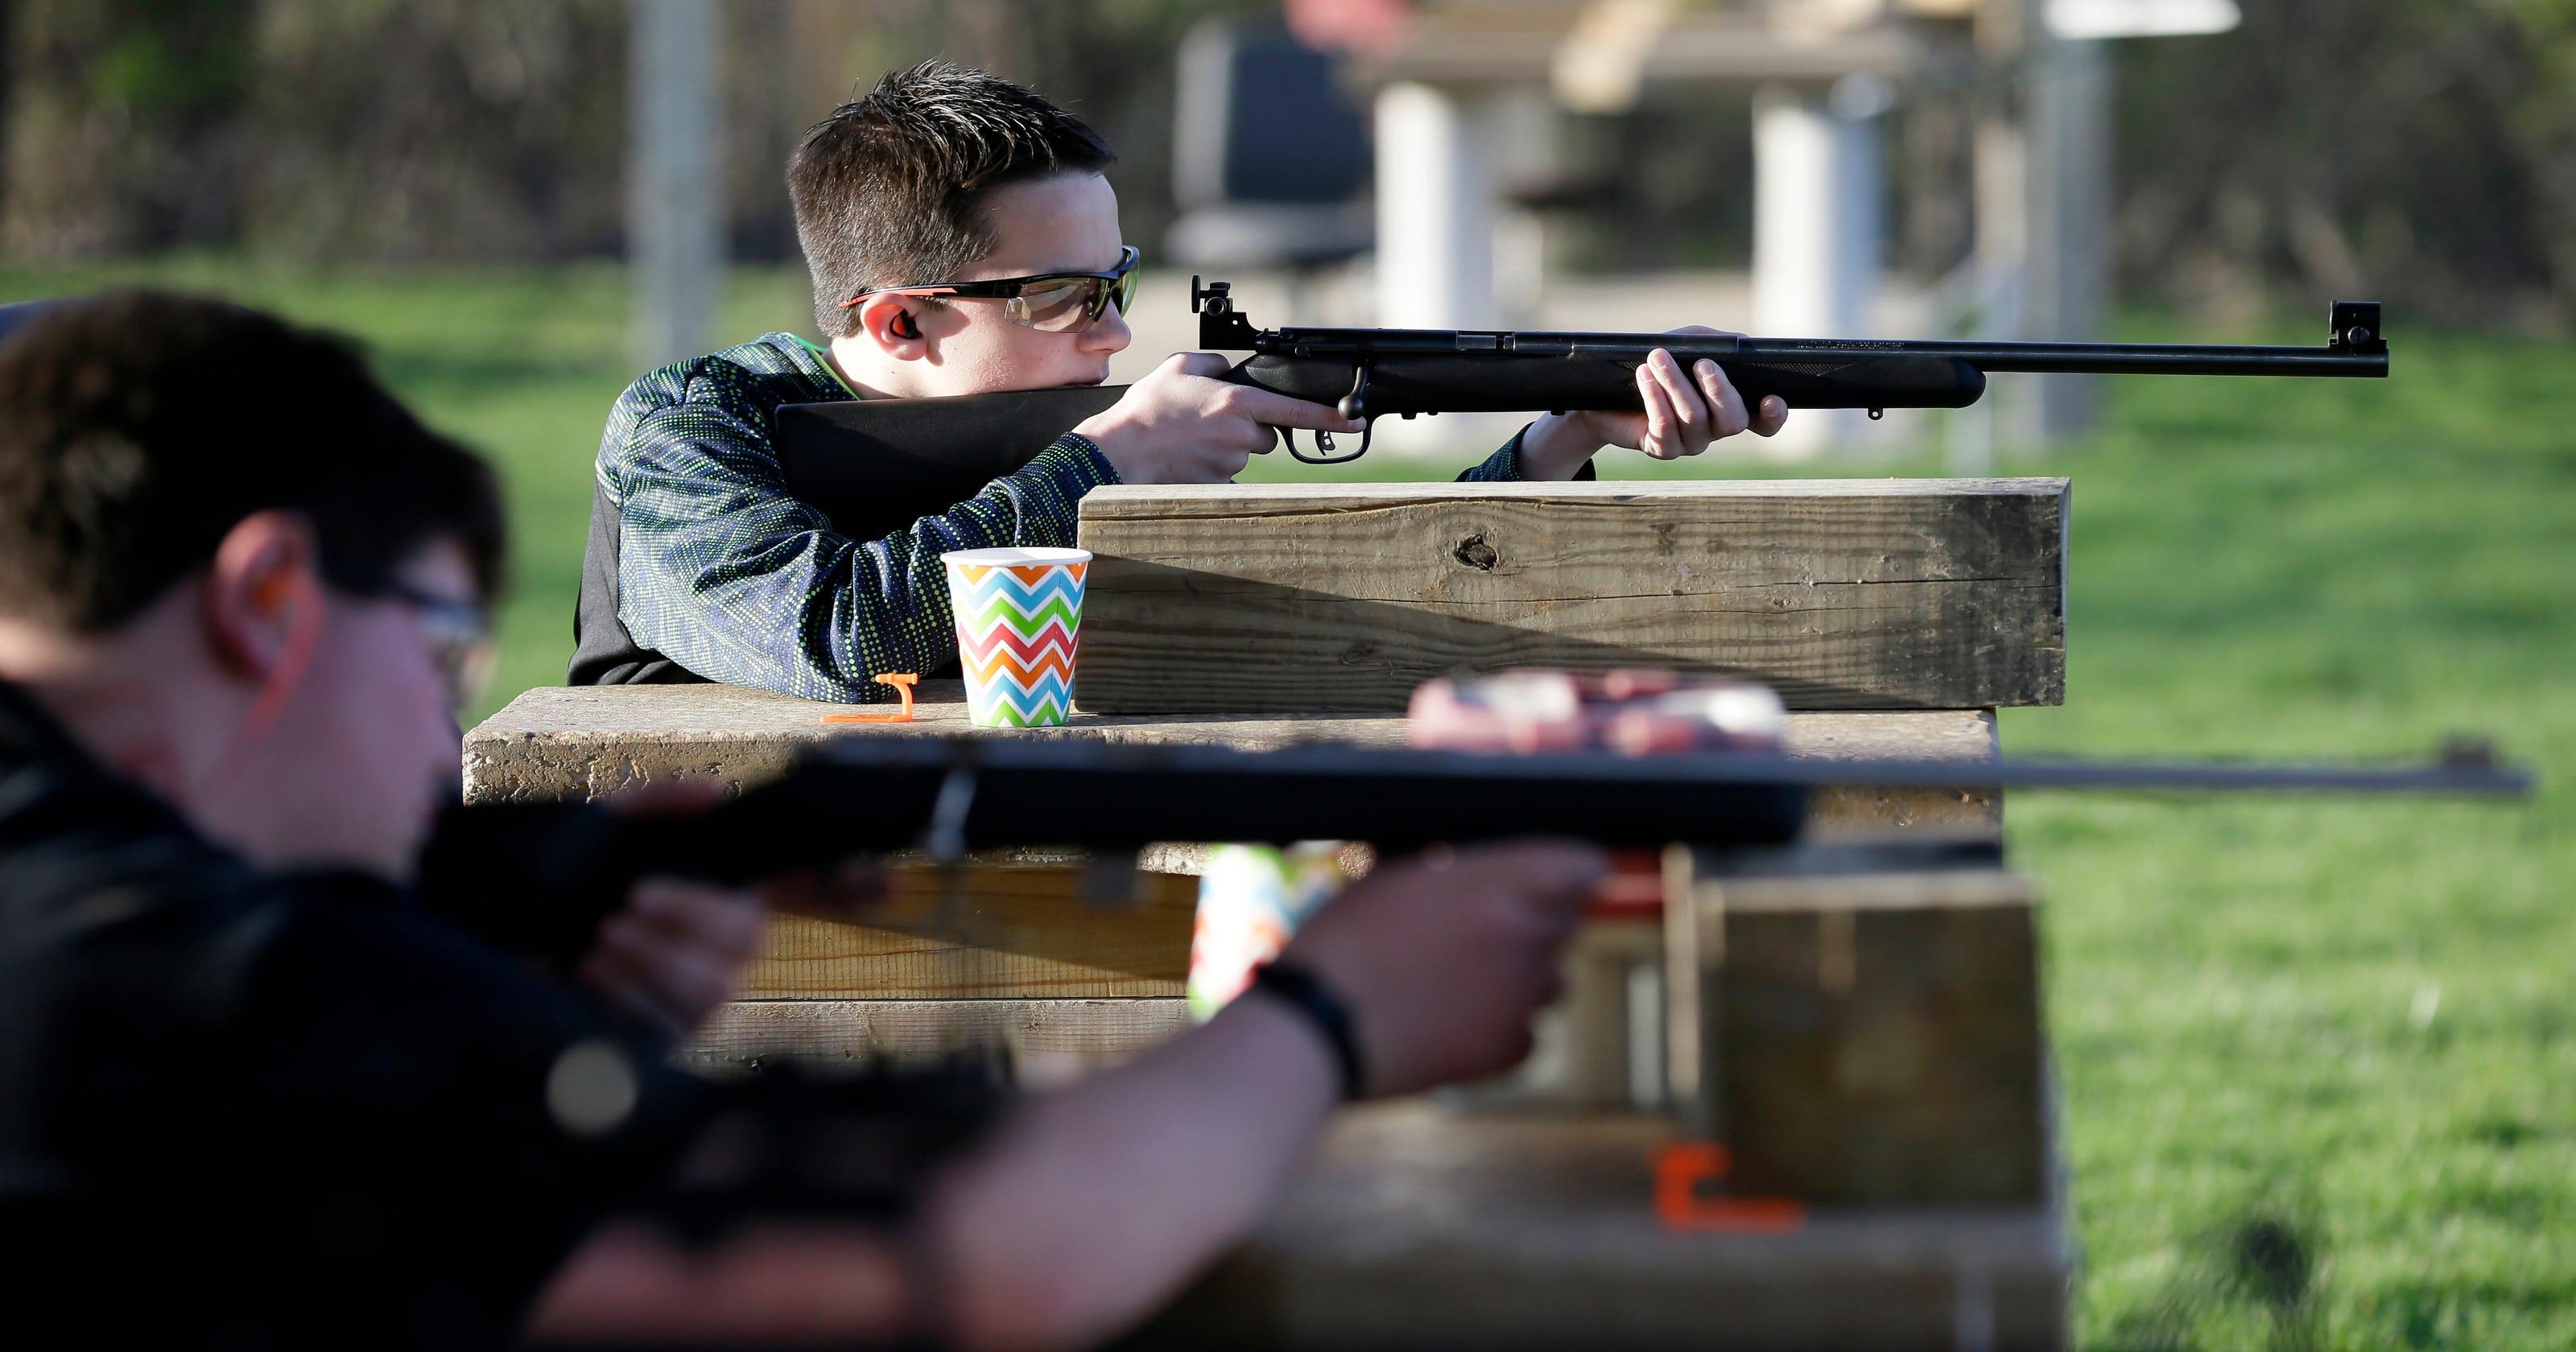 Two rural Iowa middle schools require students train in gun